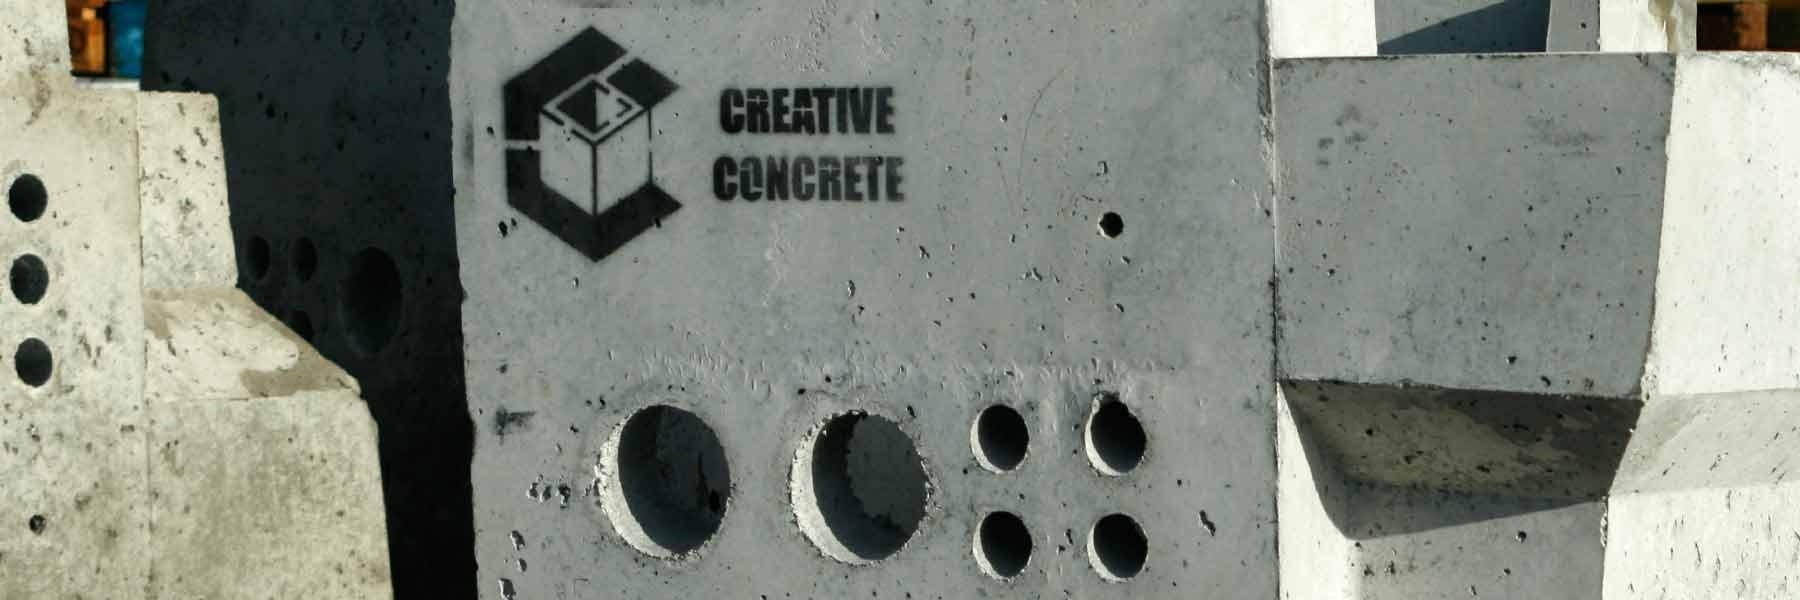 Creative Concrete Junction Box 1800 600 slider